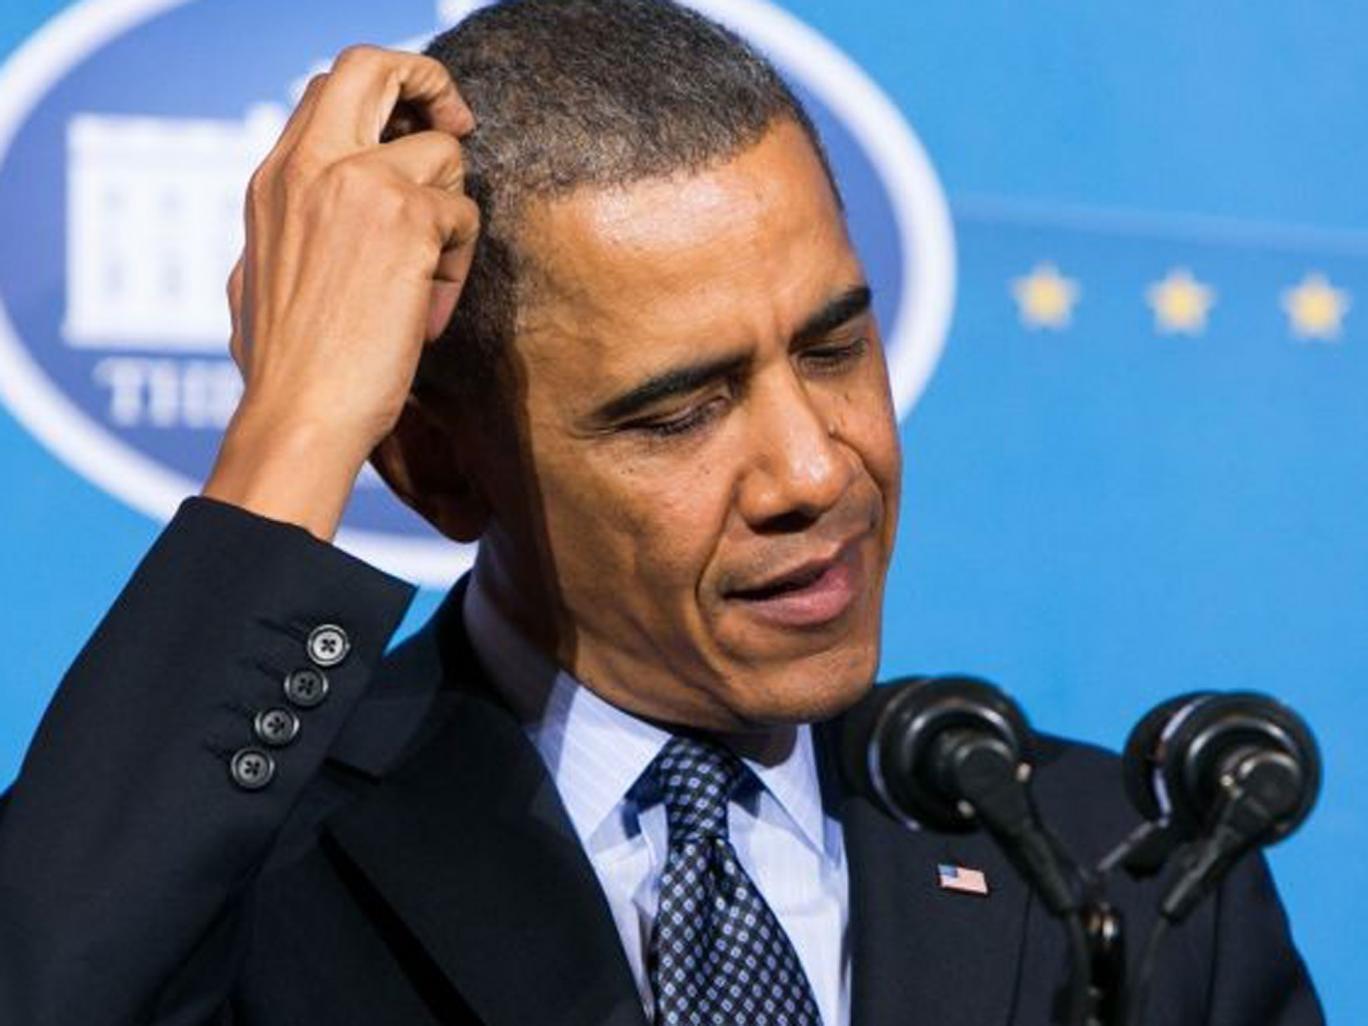 Barack Obama faces a Congressional backlash over TPP